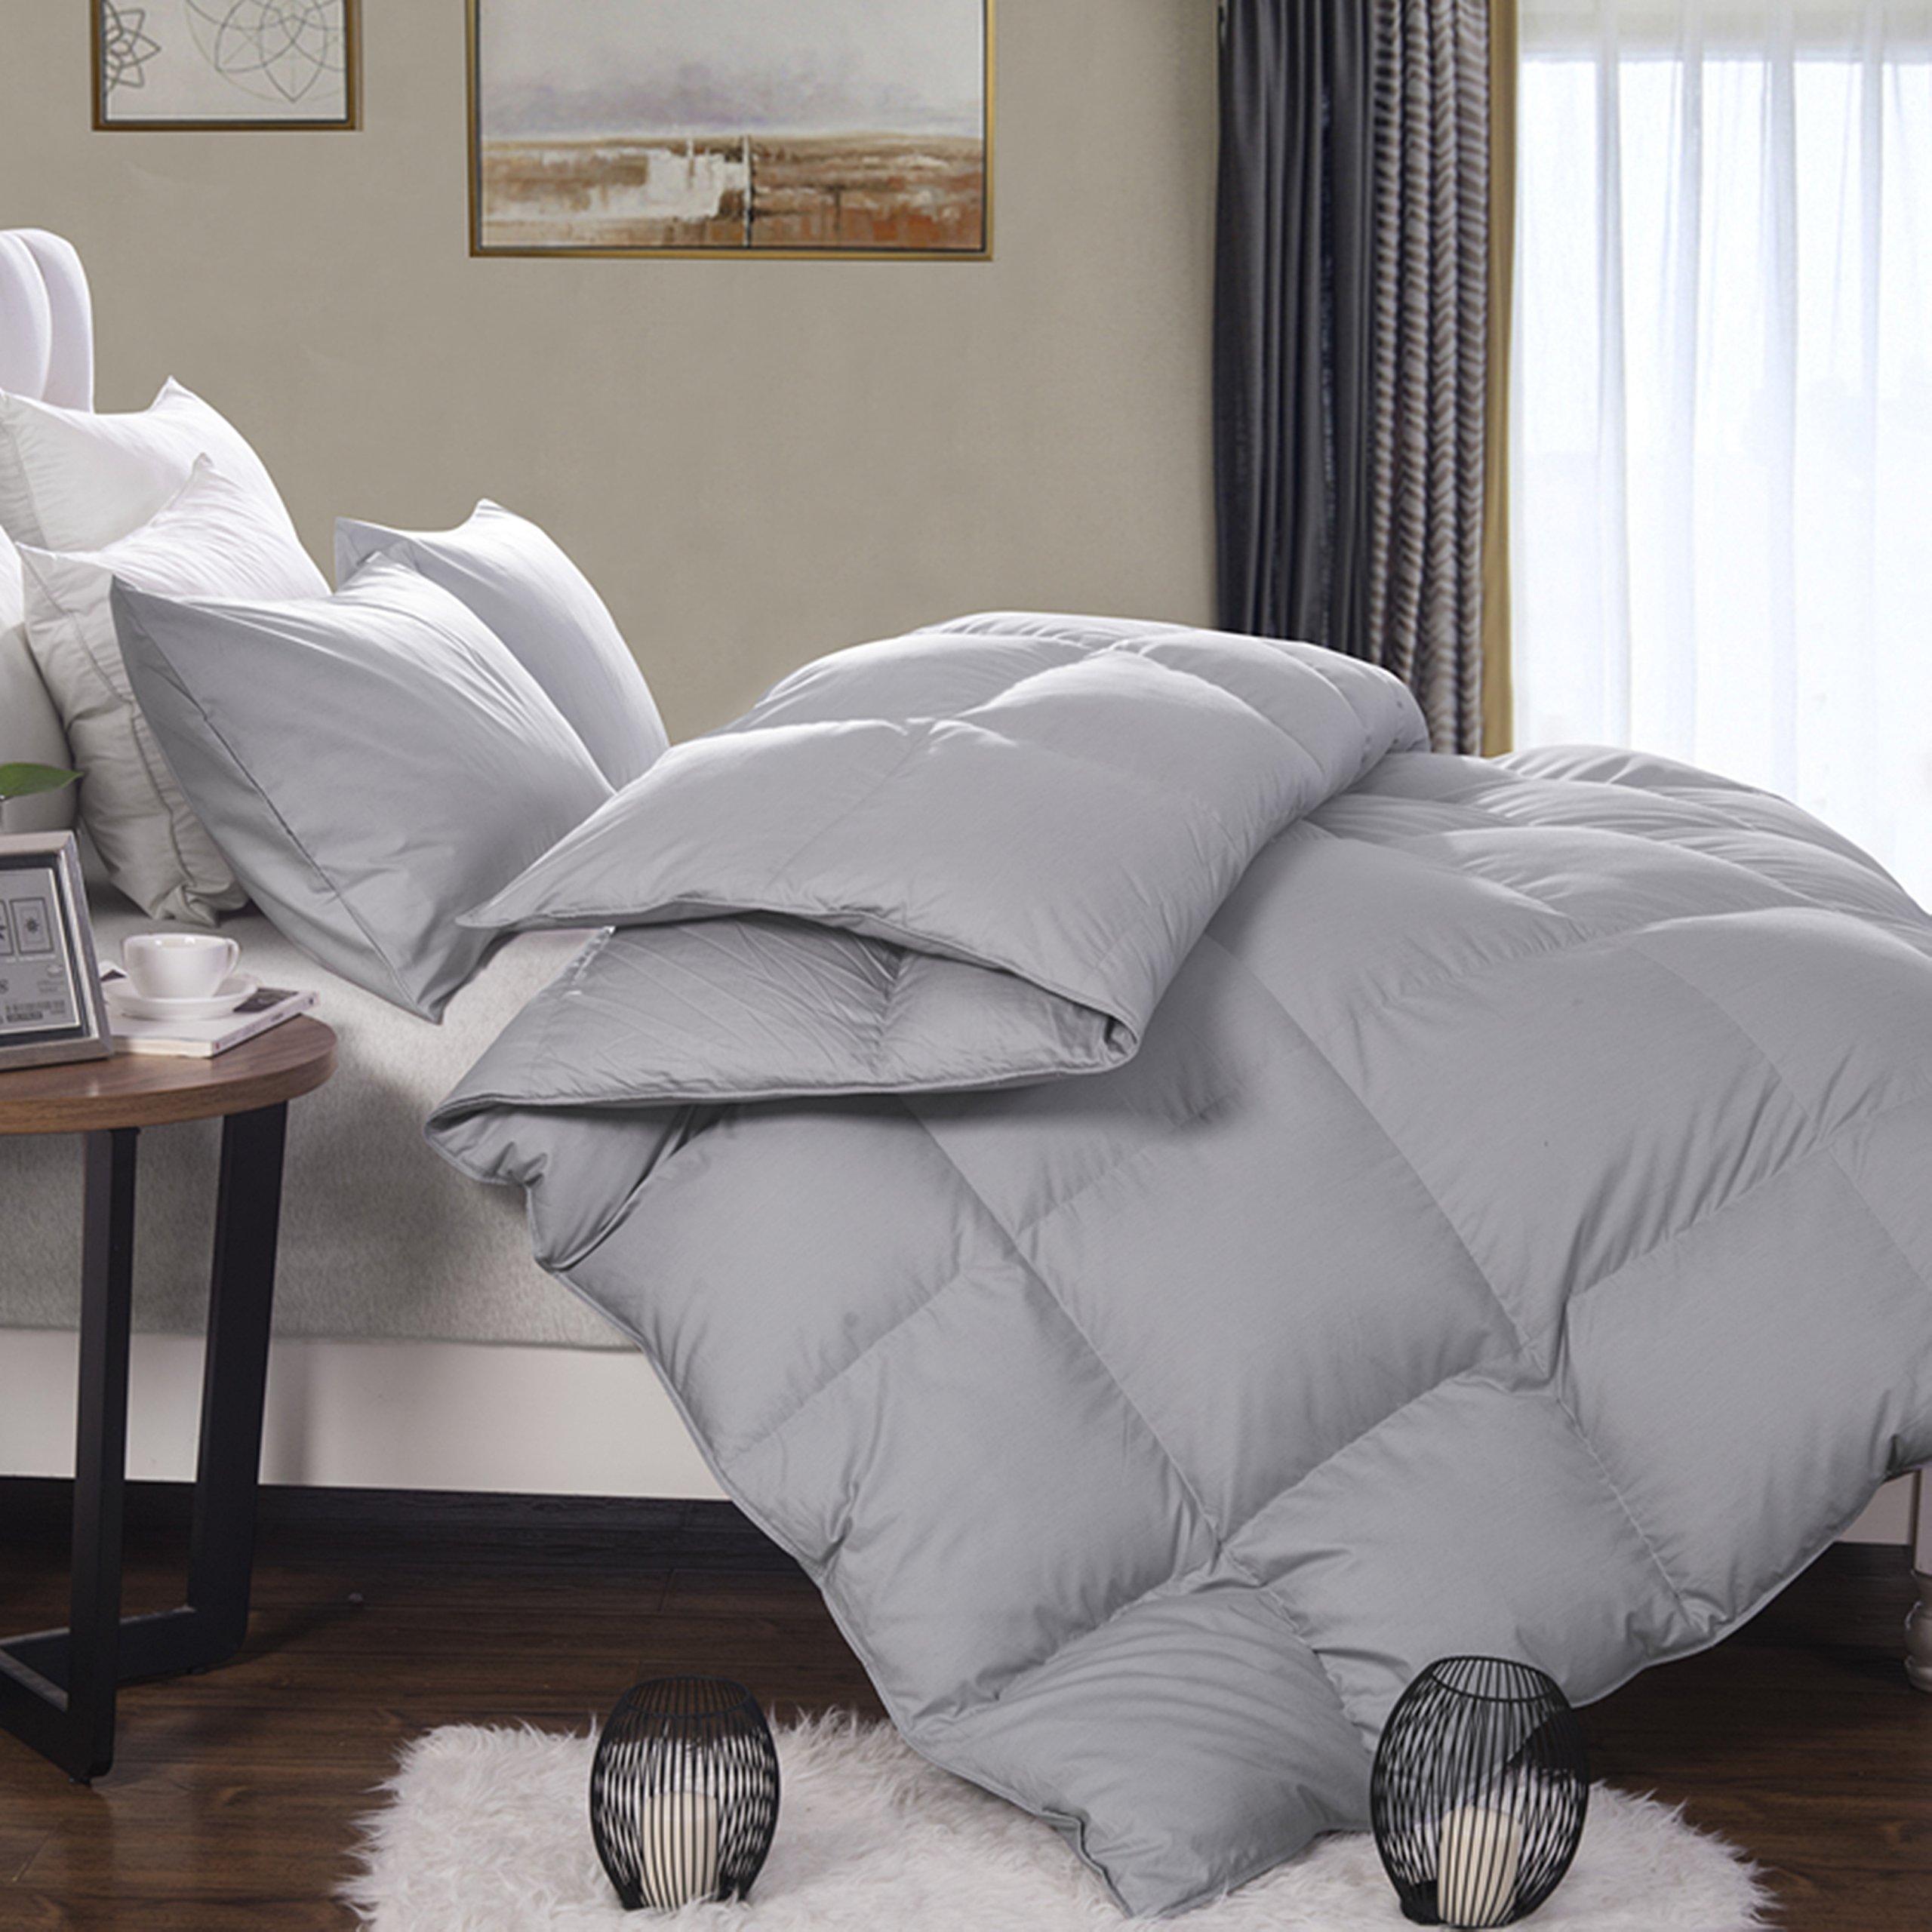 Lightweight Goose Feather Down Comforter Duvet Insert All Season,100% Organic Cotton Cover, Grey (Queen)